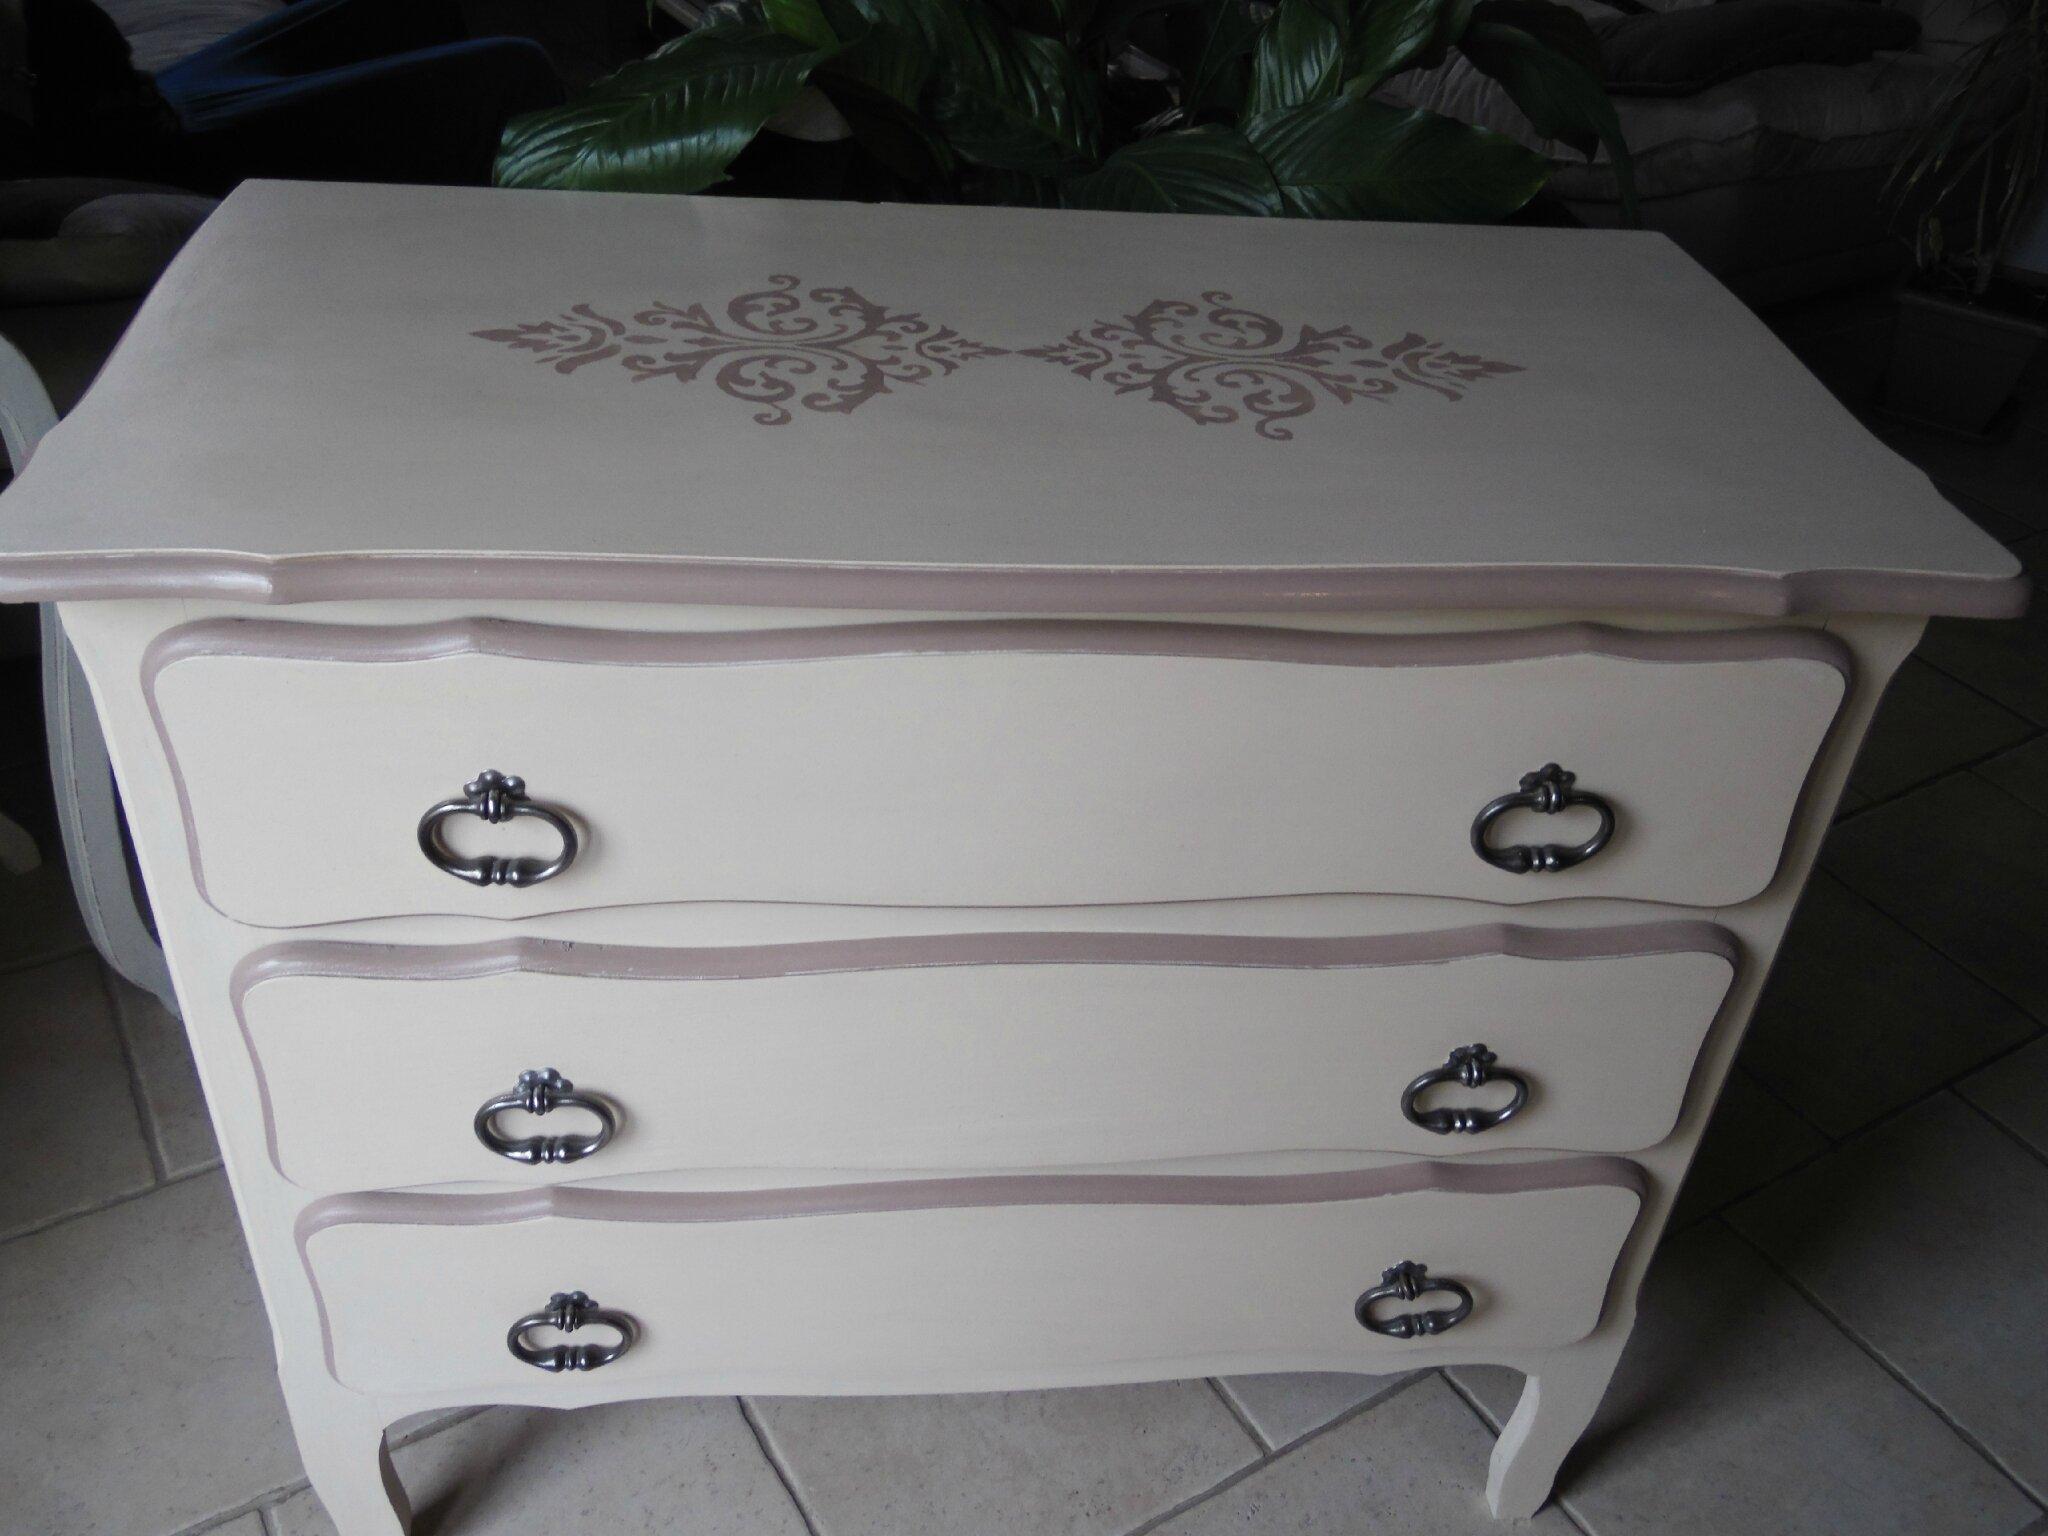 Des meubles relooker forum d coration int rieure for Meuble a relooker